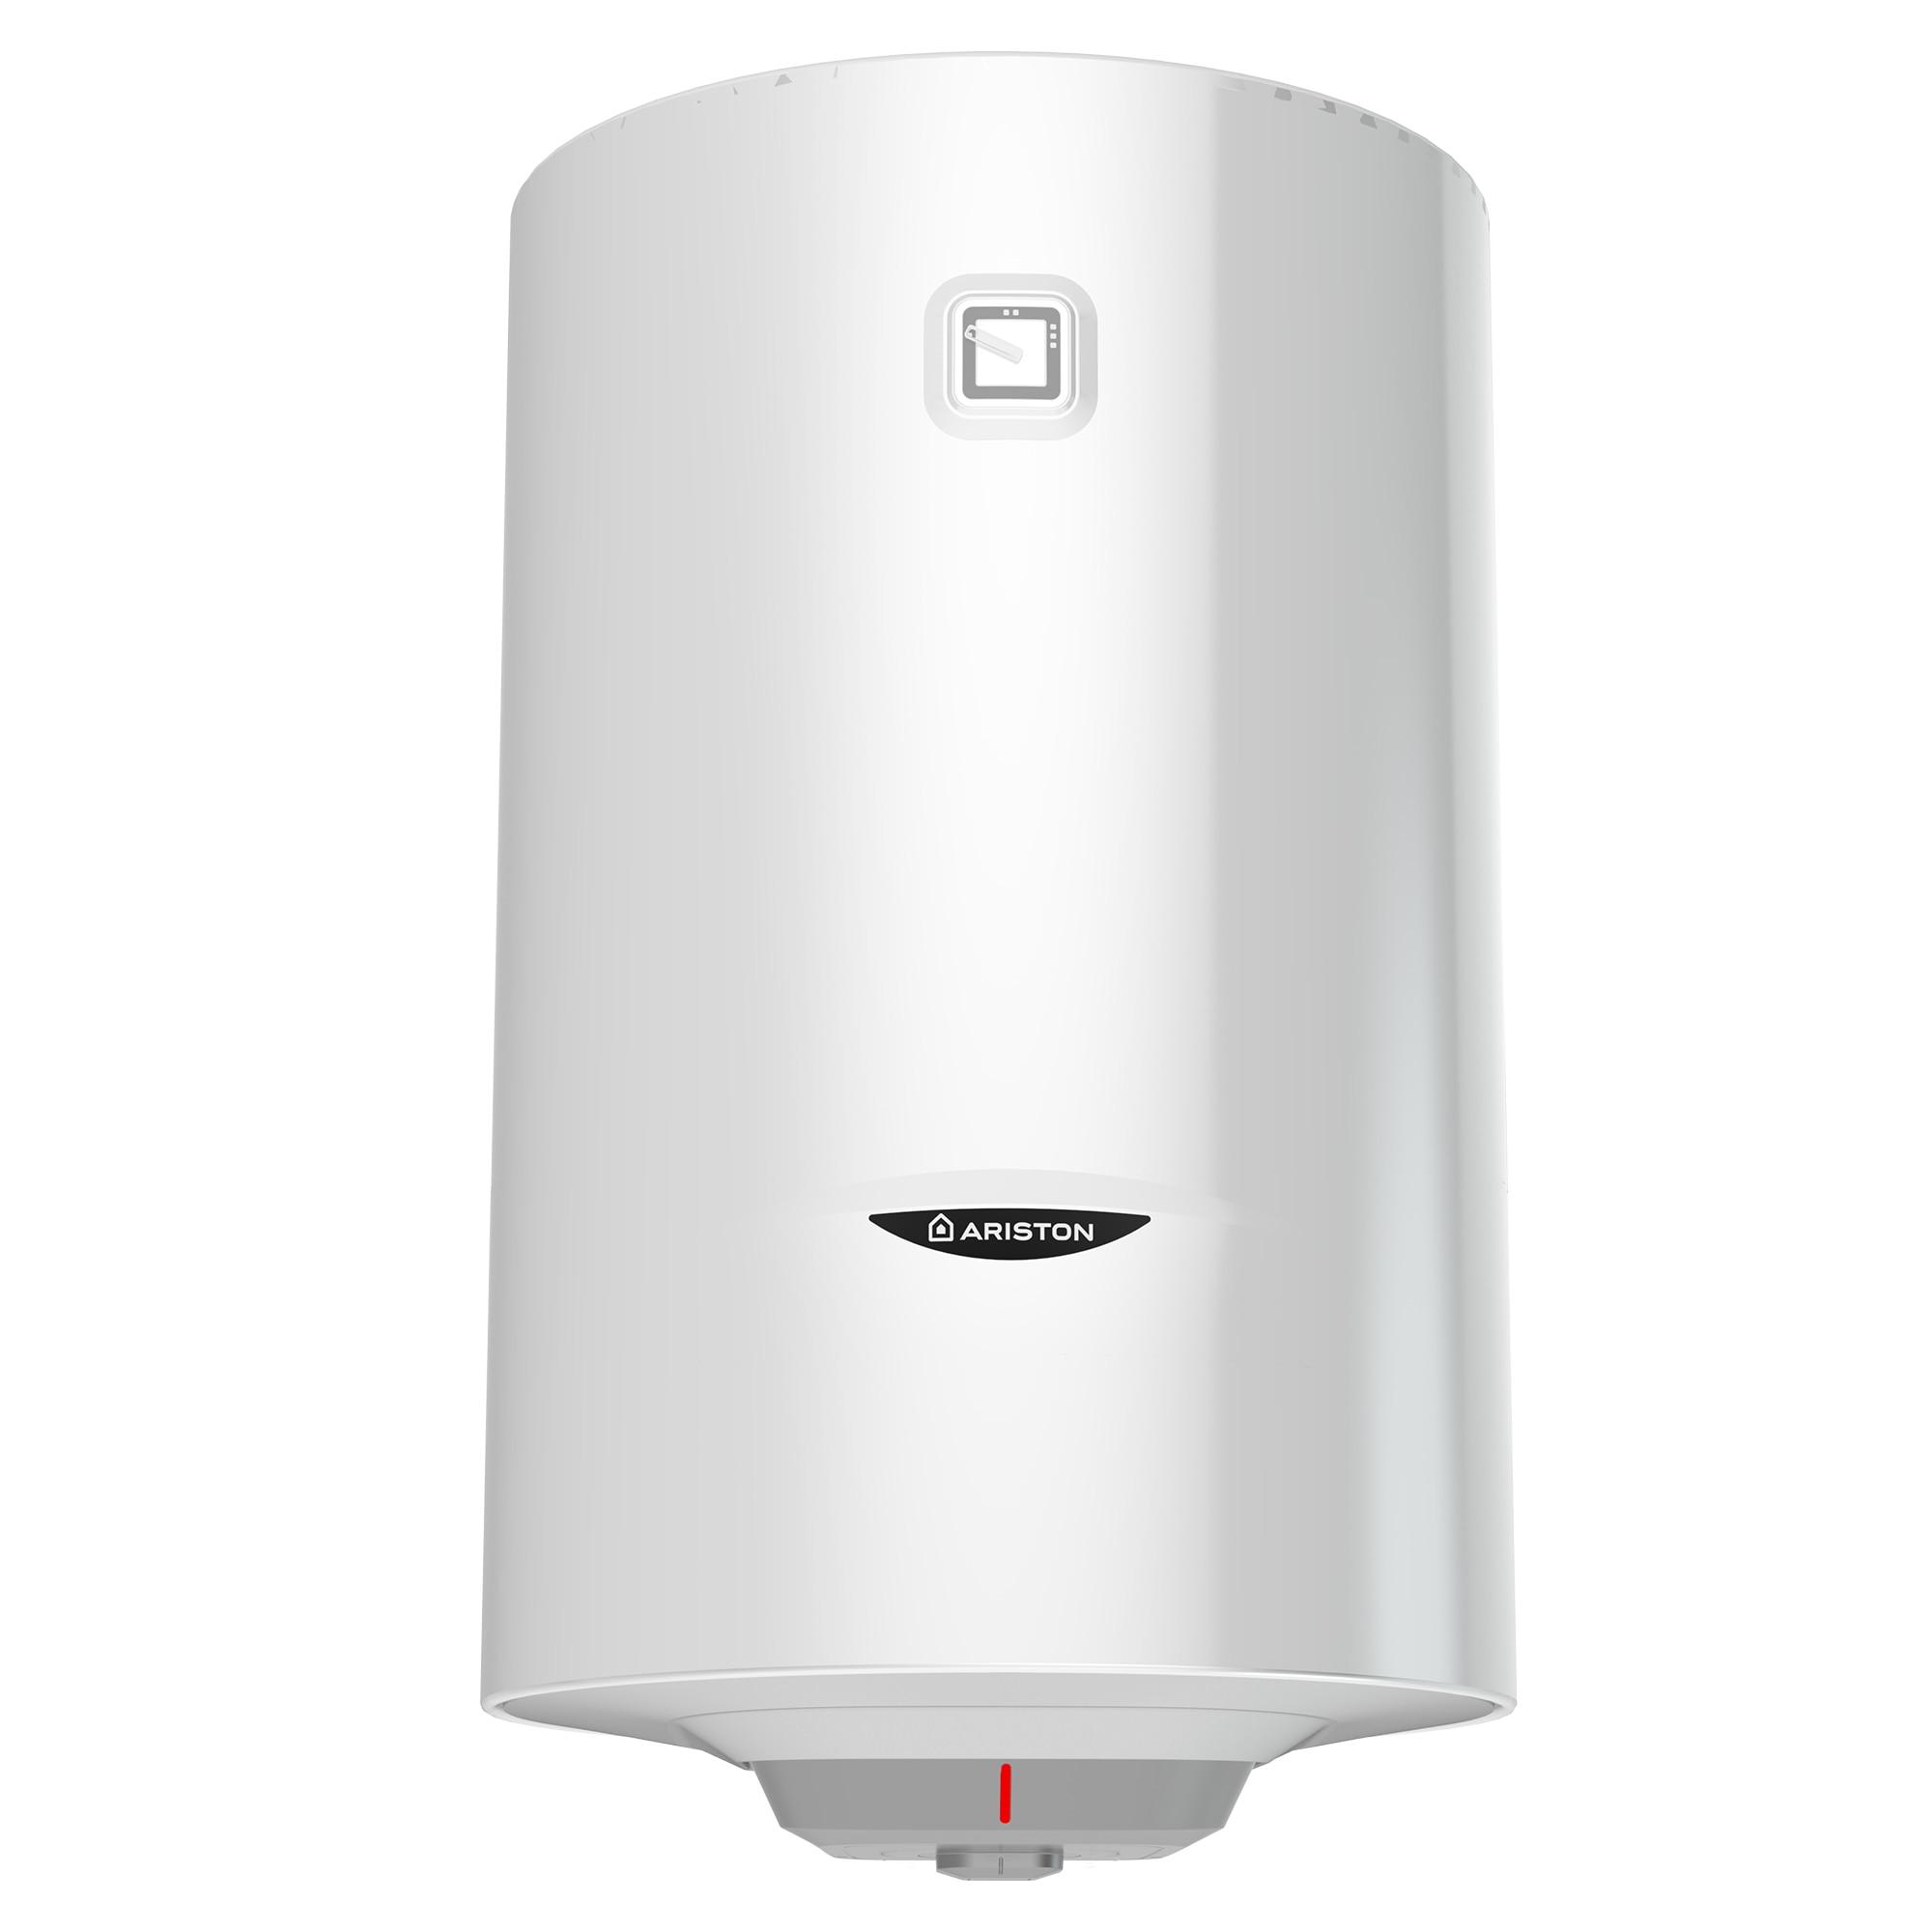 Fotografie Boiler termoelectric Ariston Pro 1 R VTS 100L, 1800W, serpentina pe partea stanga